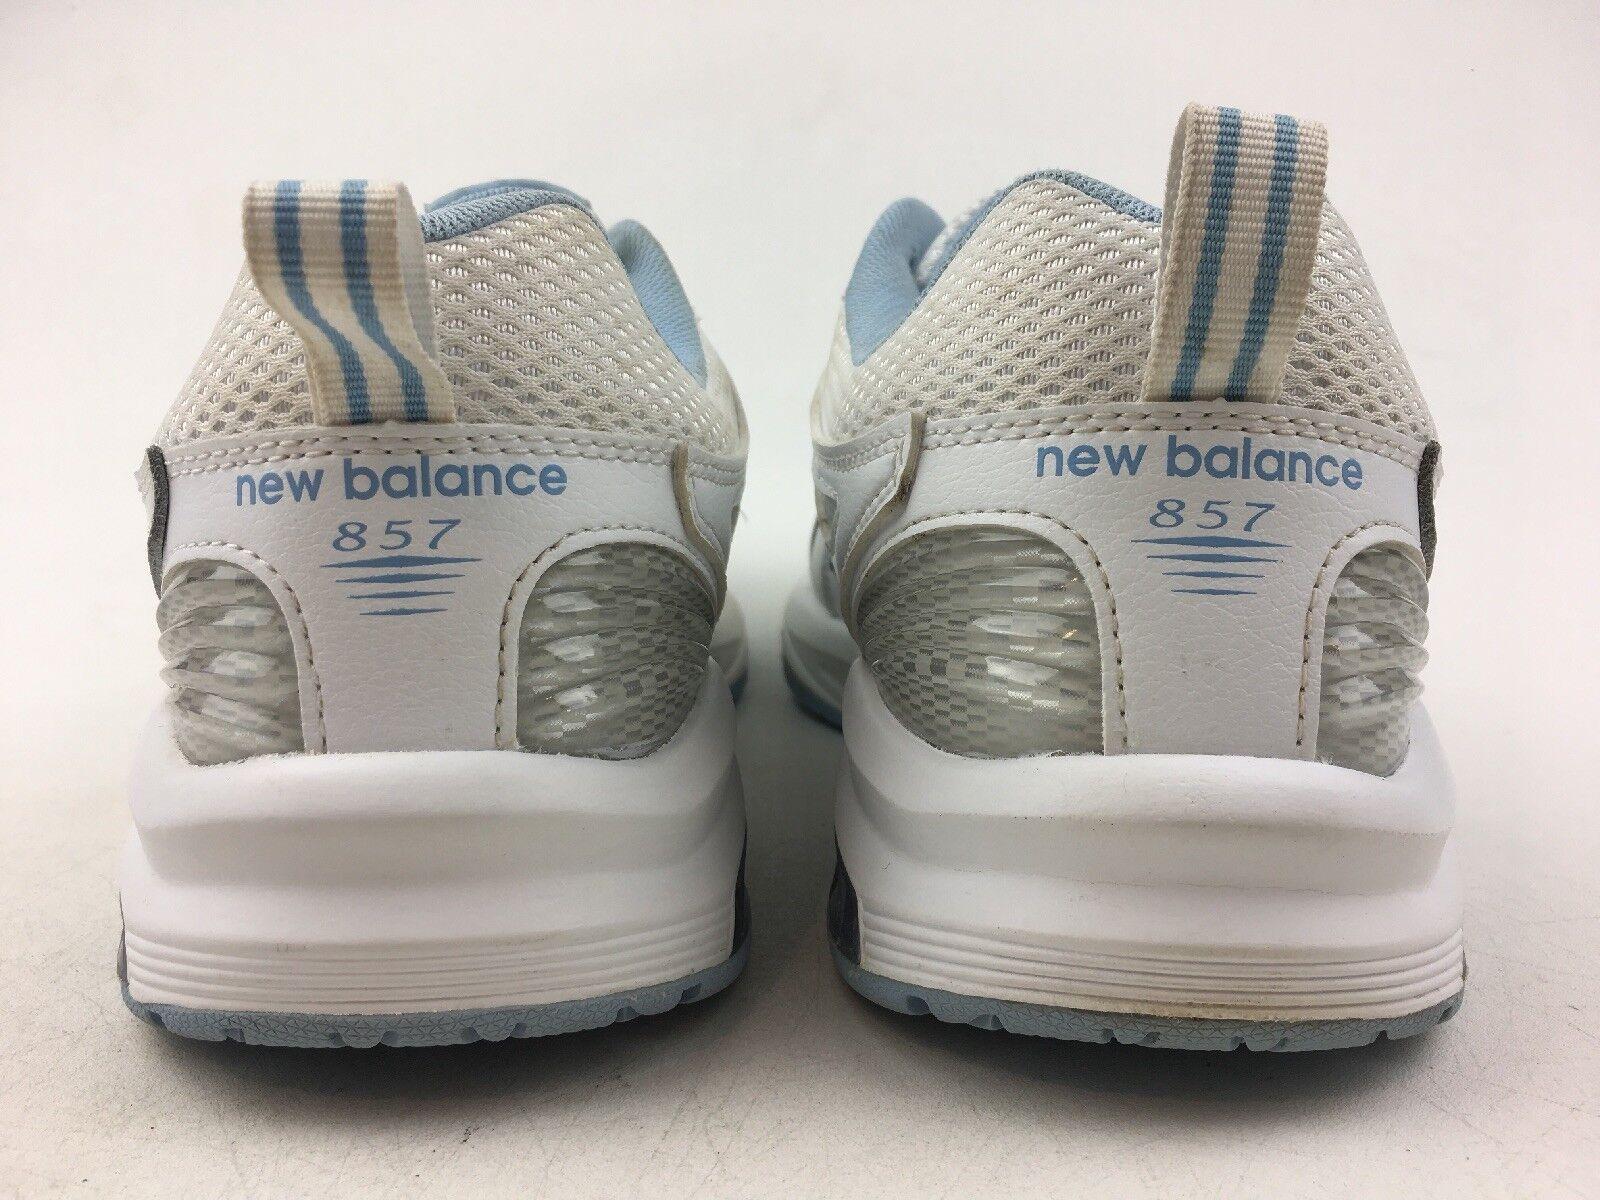 New Balance WX857WB2 Training Training Training scarpe - Wouomo Dimensione 10.5 D, bianca blu 1348 e0b2af